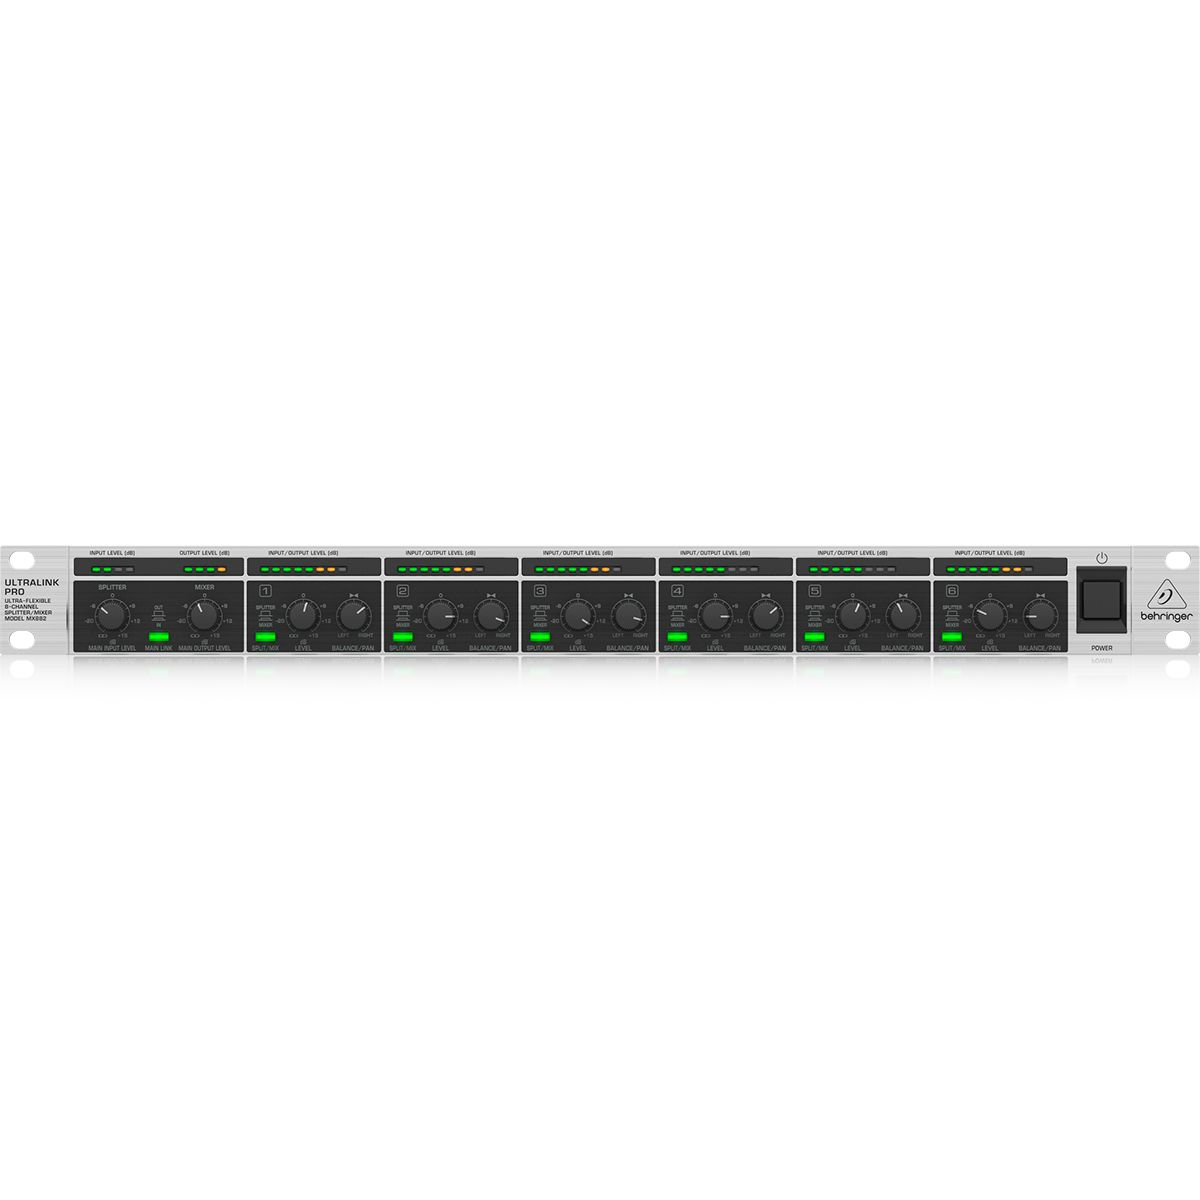 Mixer Dj Behringer Ultralink Pro MX882 8 Canais 110V